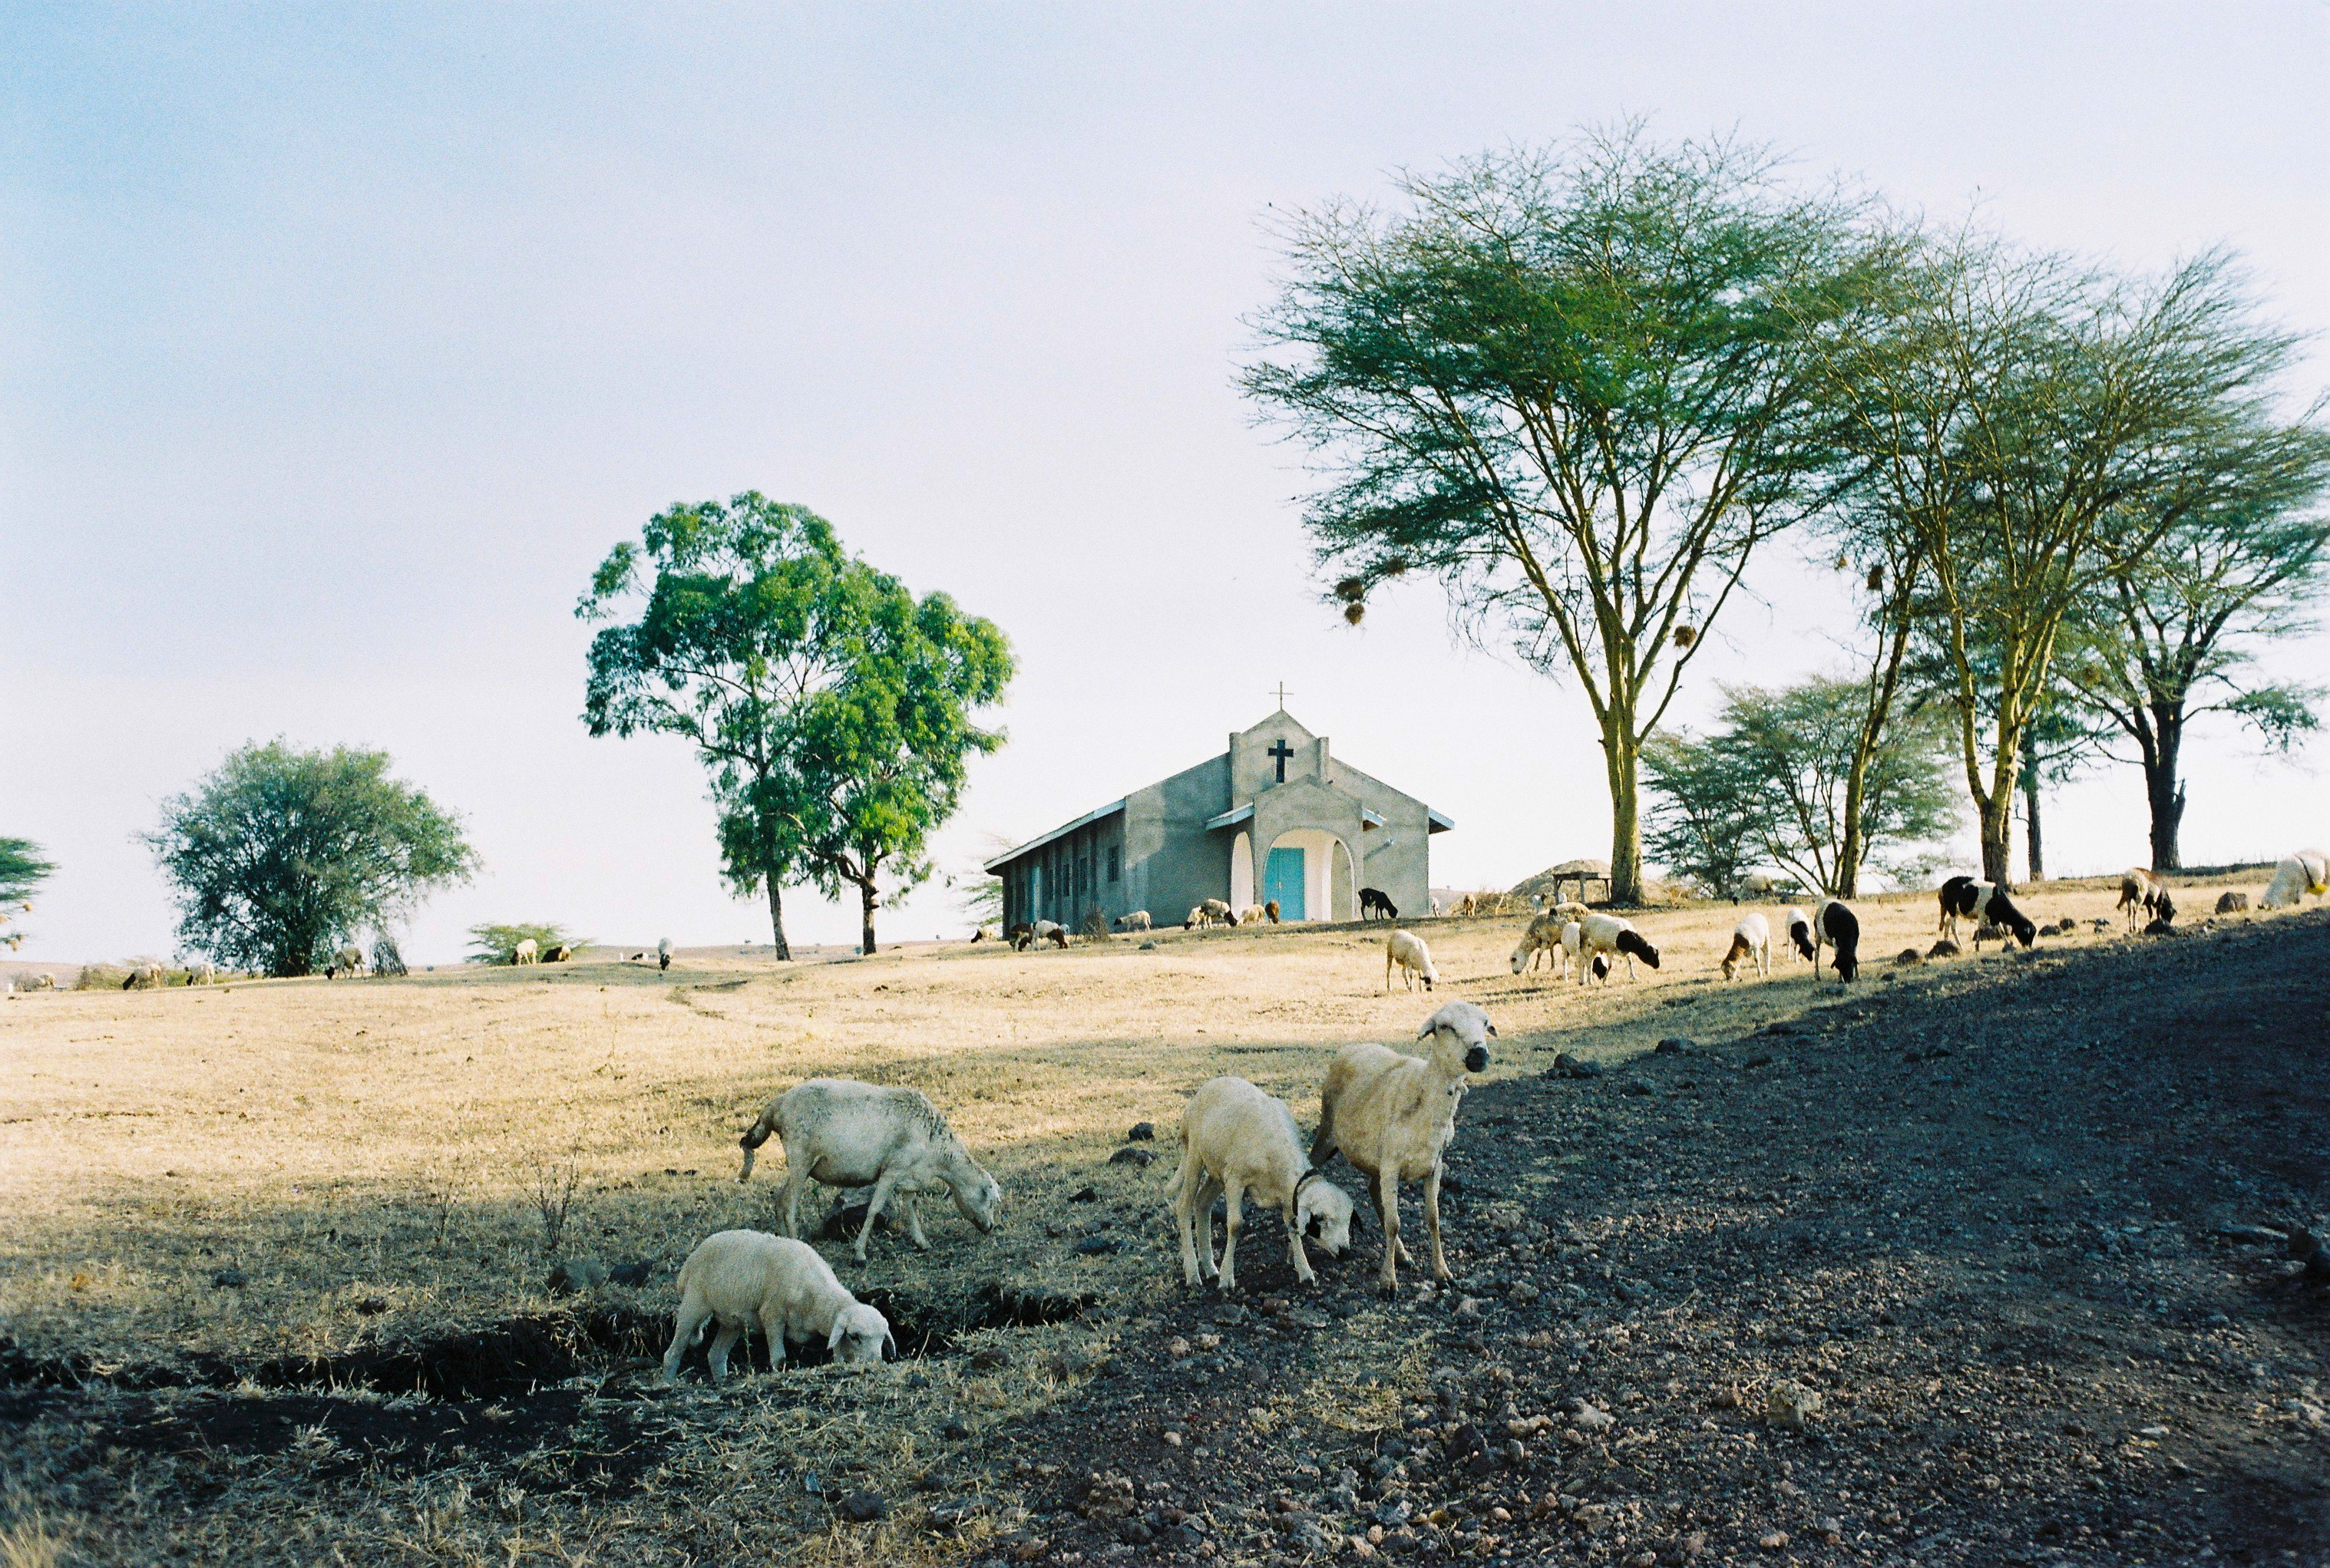 Endulen, Tanzania